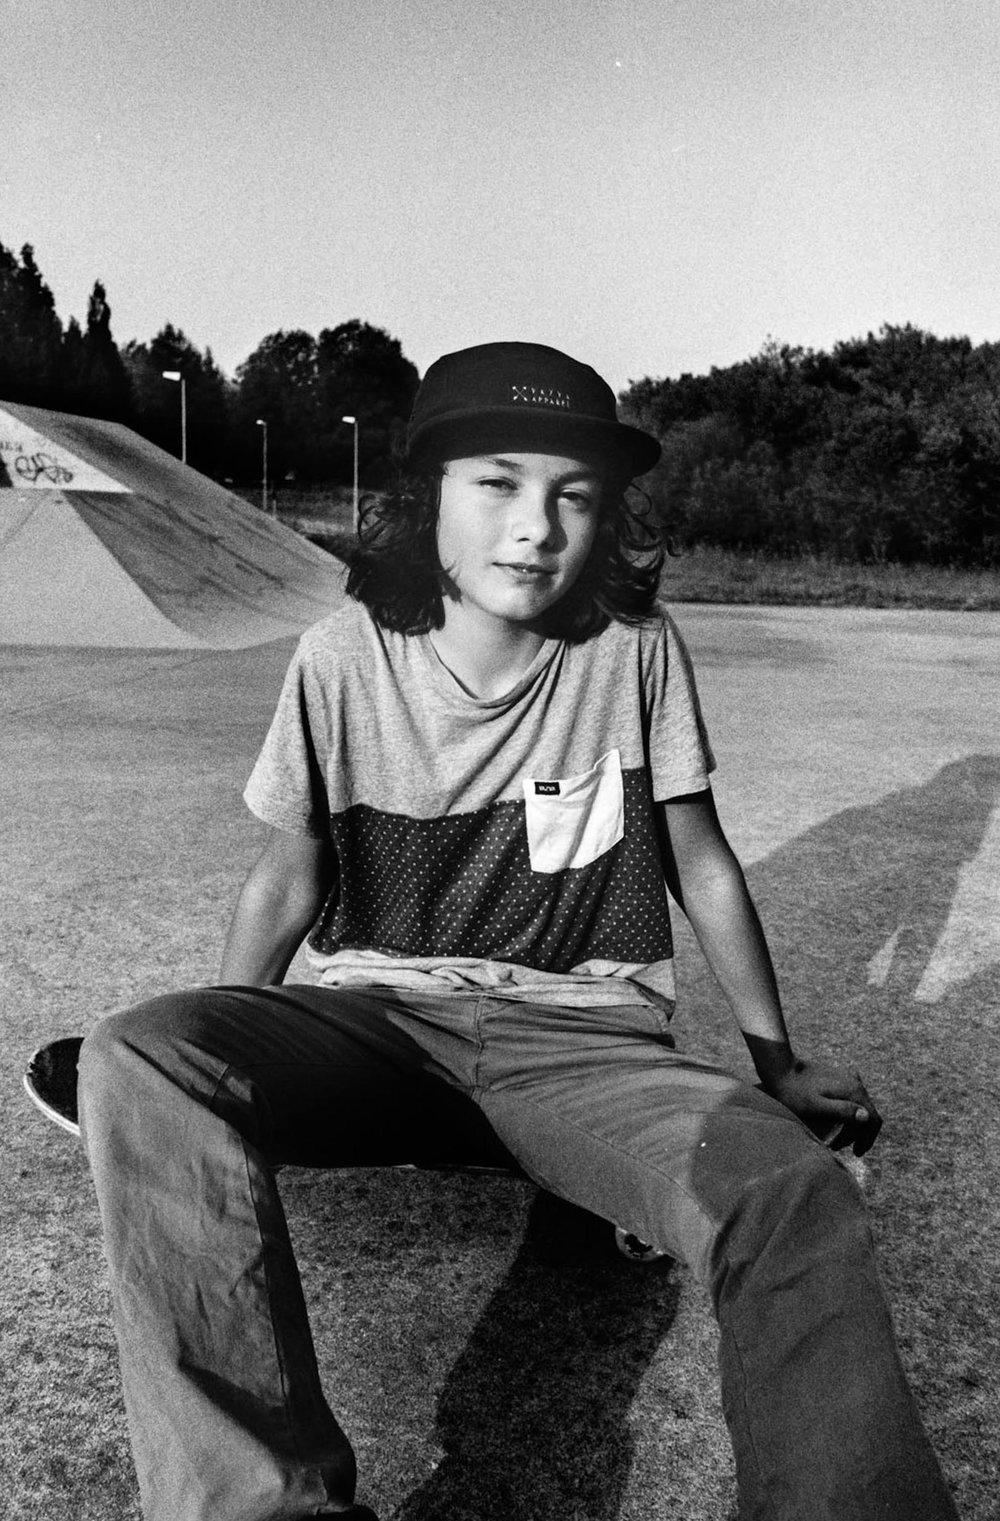 fotografia-coruña-skate-34.jpg